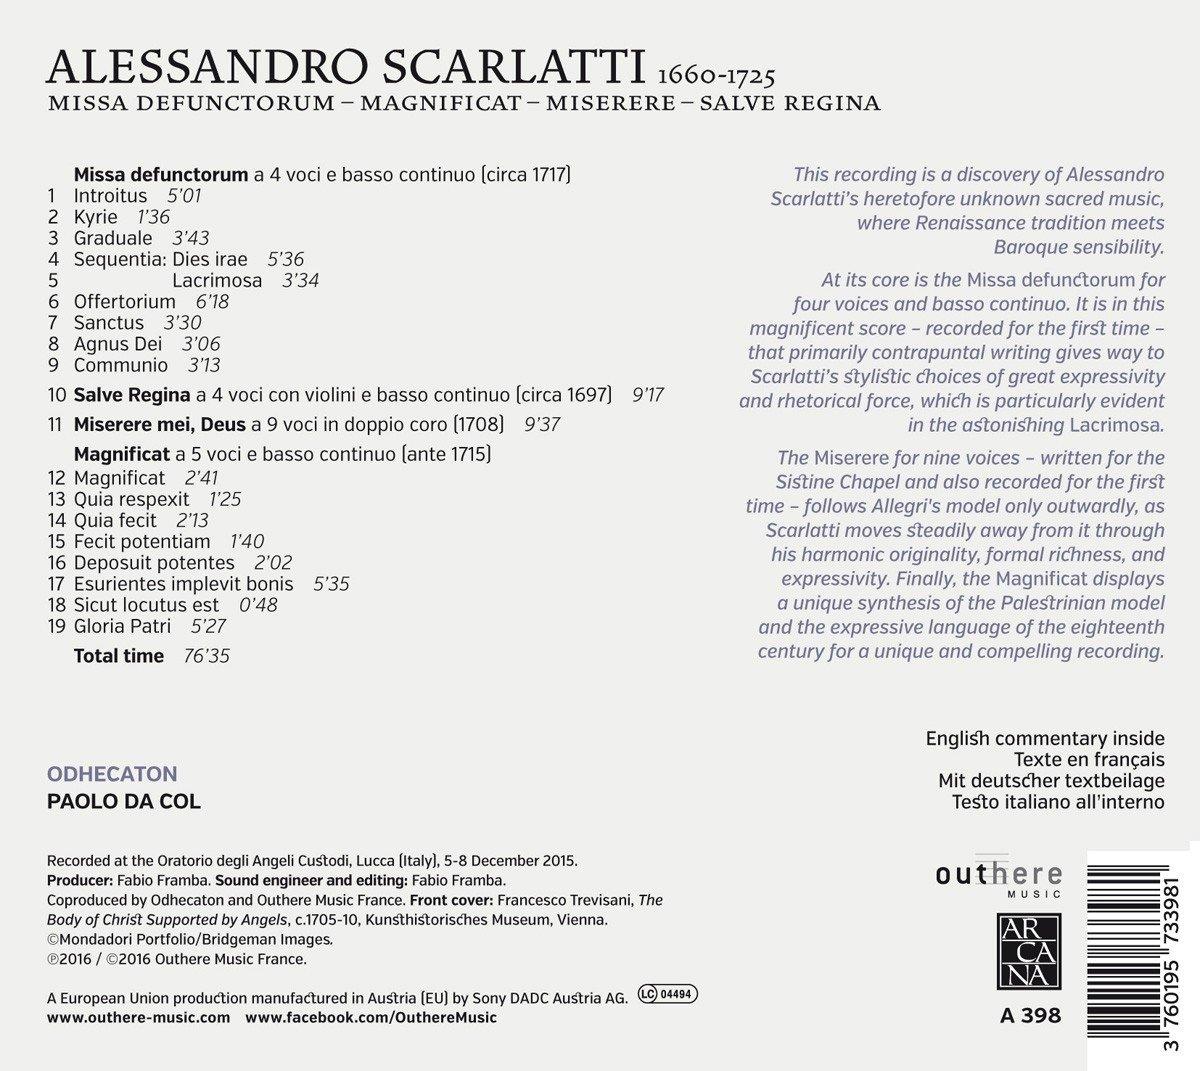 Alessandro Scarlatti (1660-1725) 71XWc2RQNVL._SL1200_